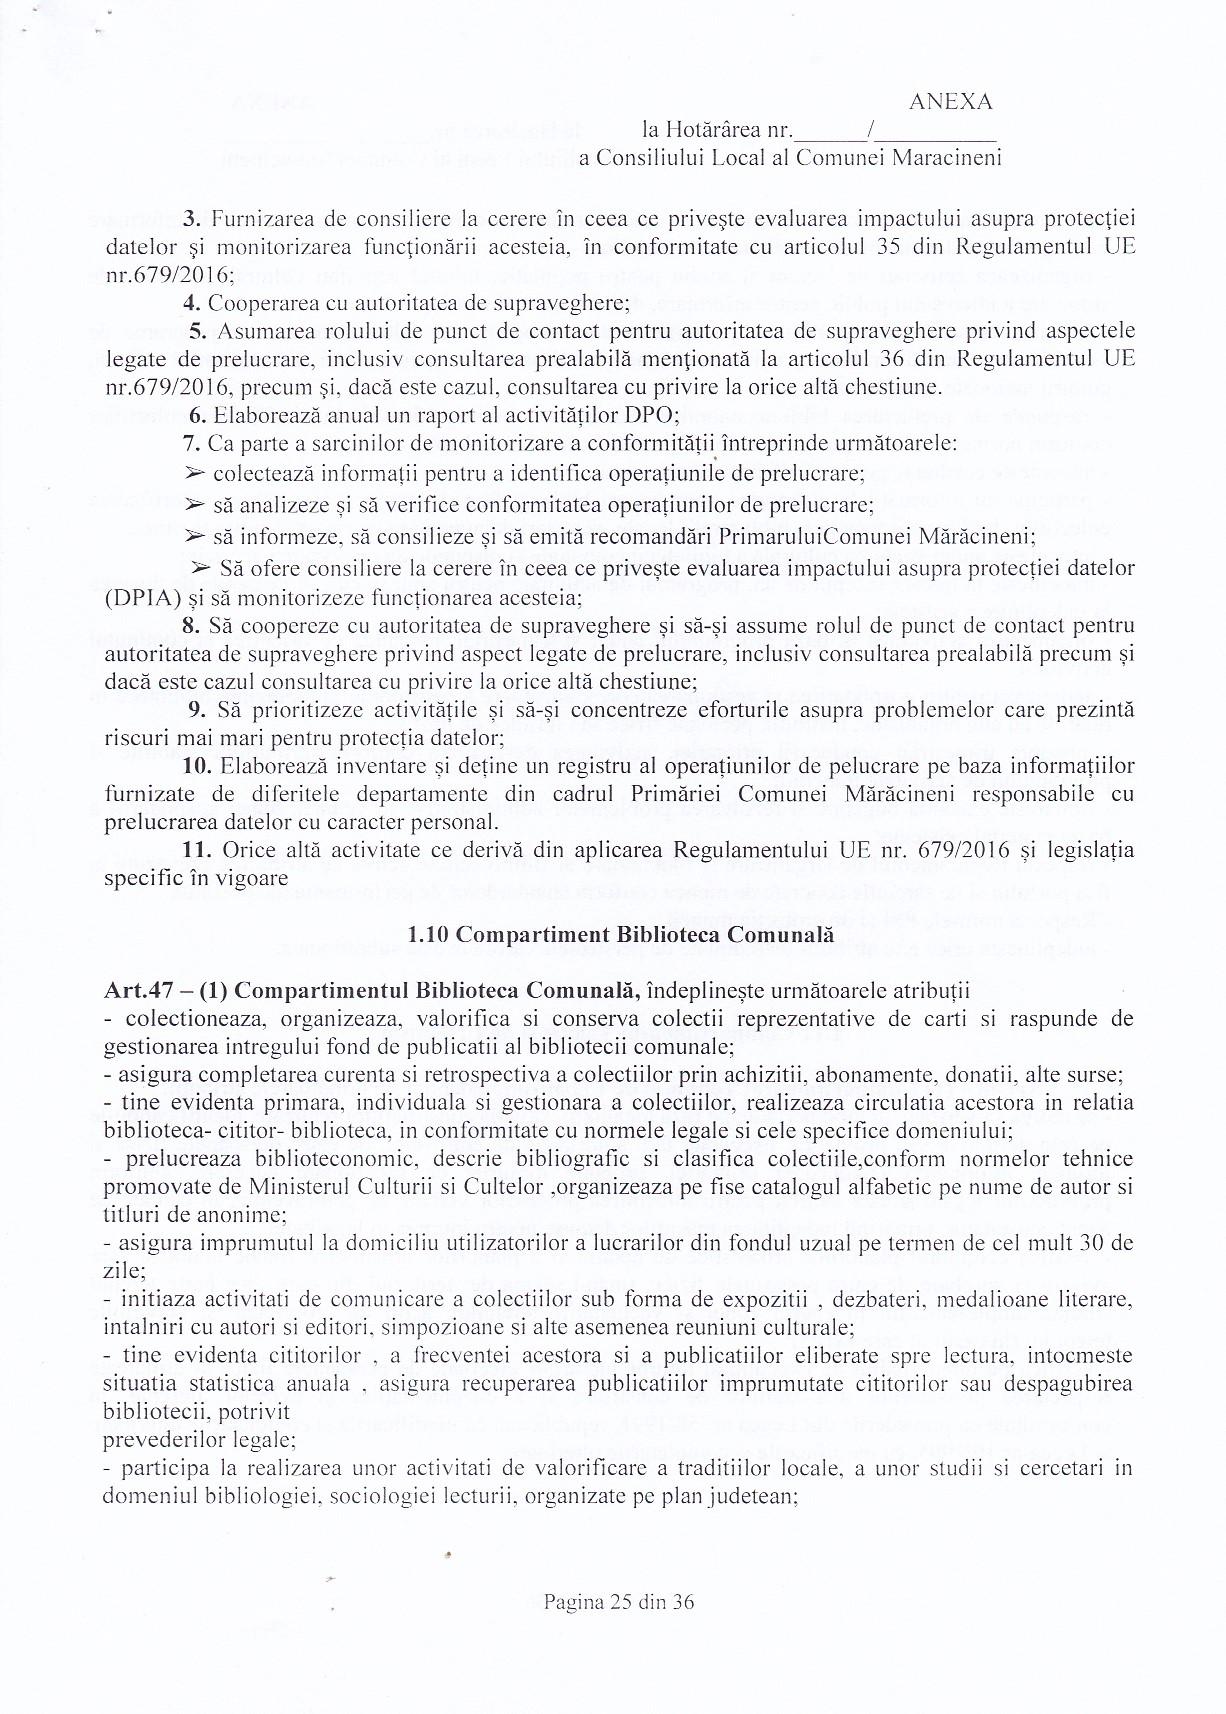 Escorte strada sighisoara, Intalniri online in romania costum popular pentru femei si barbati